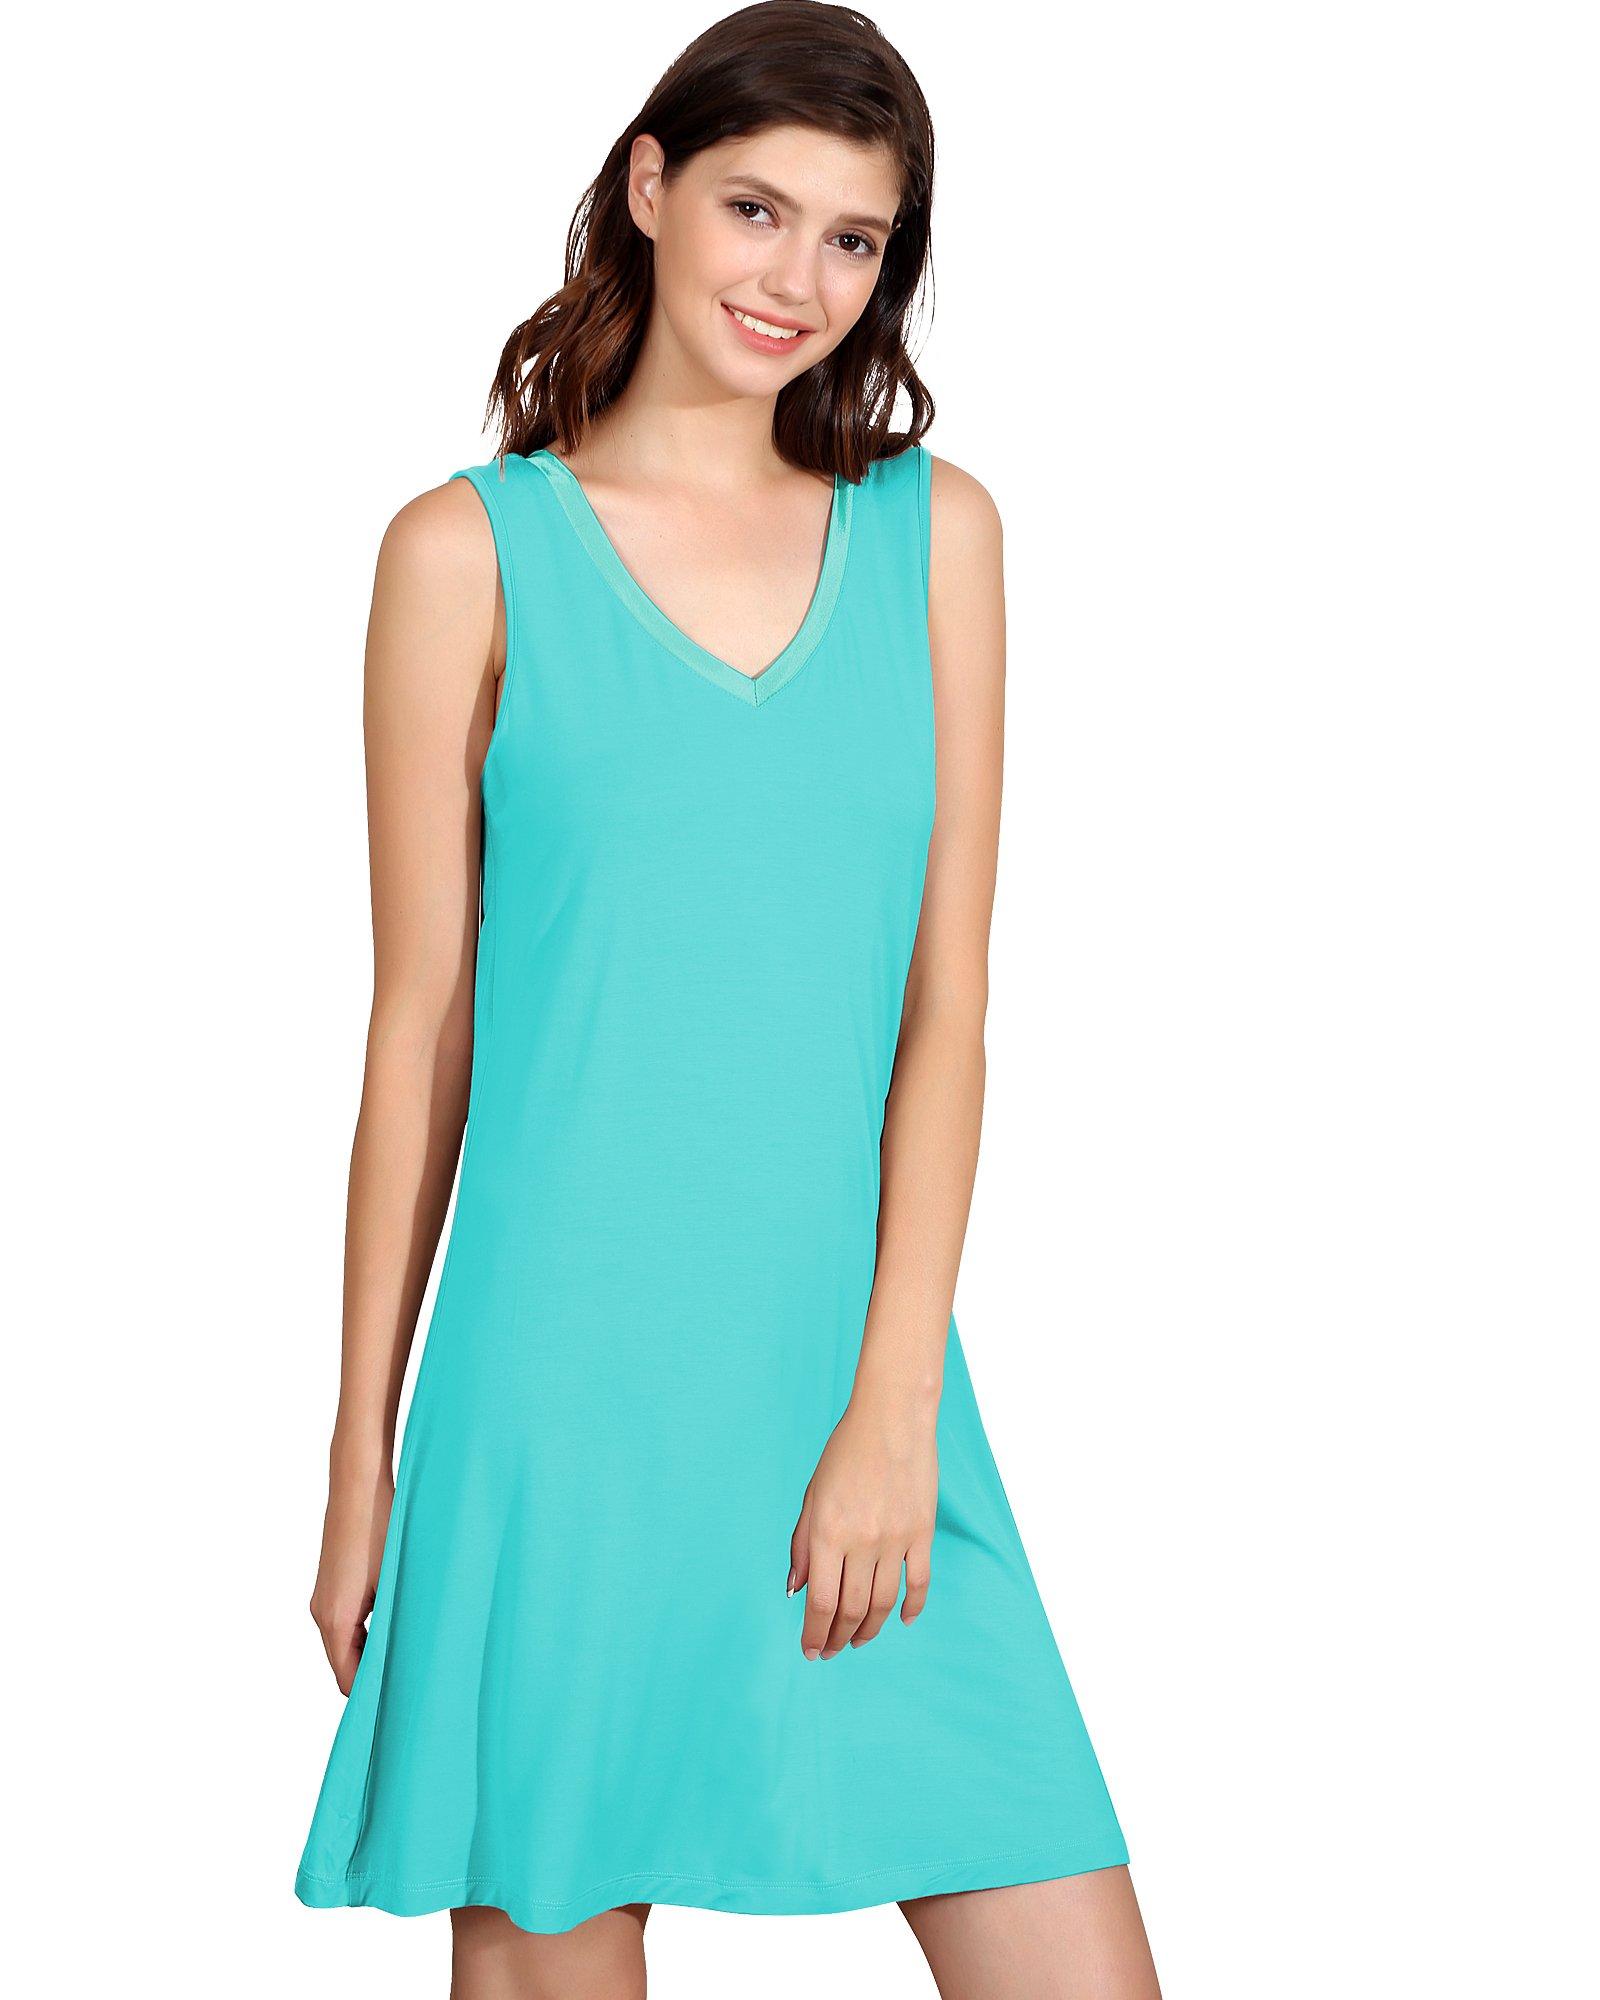 GYS Womens Bamboo Viscose Sleeveless V Neck Nightgown (L, Emerald Green)